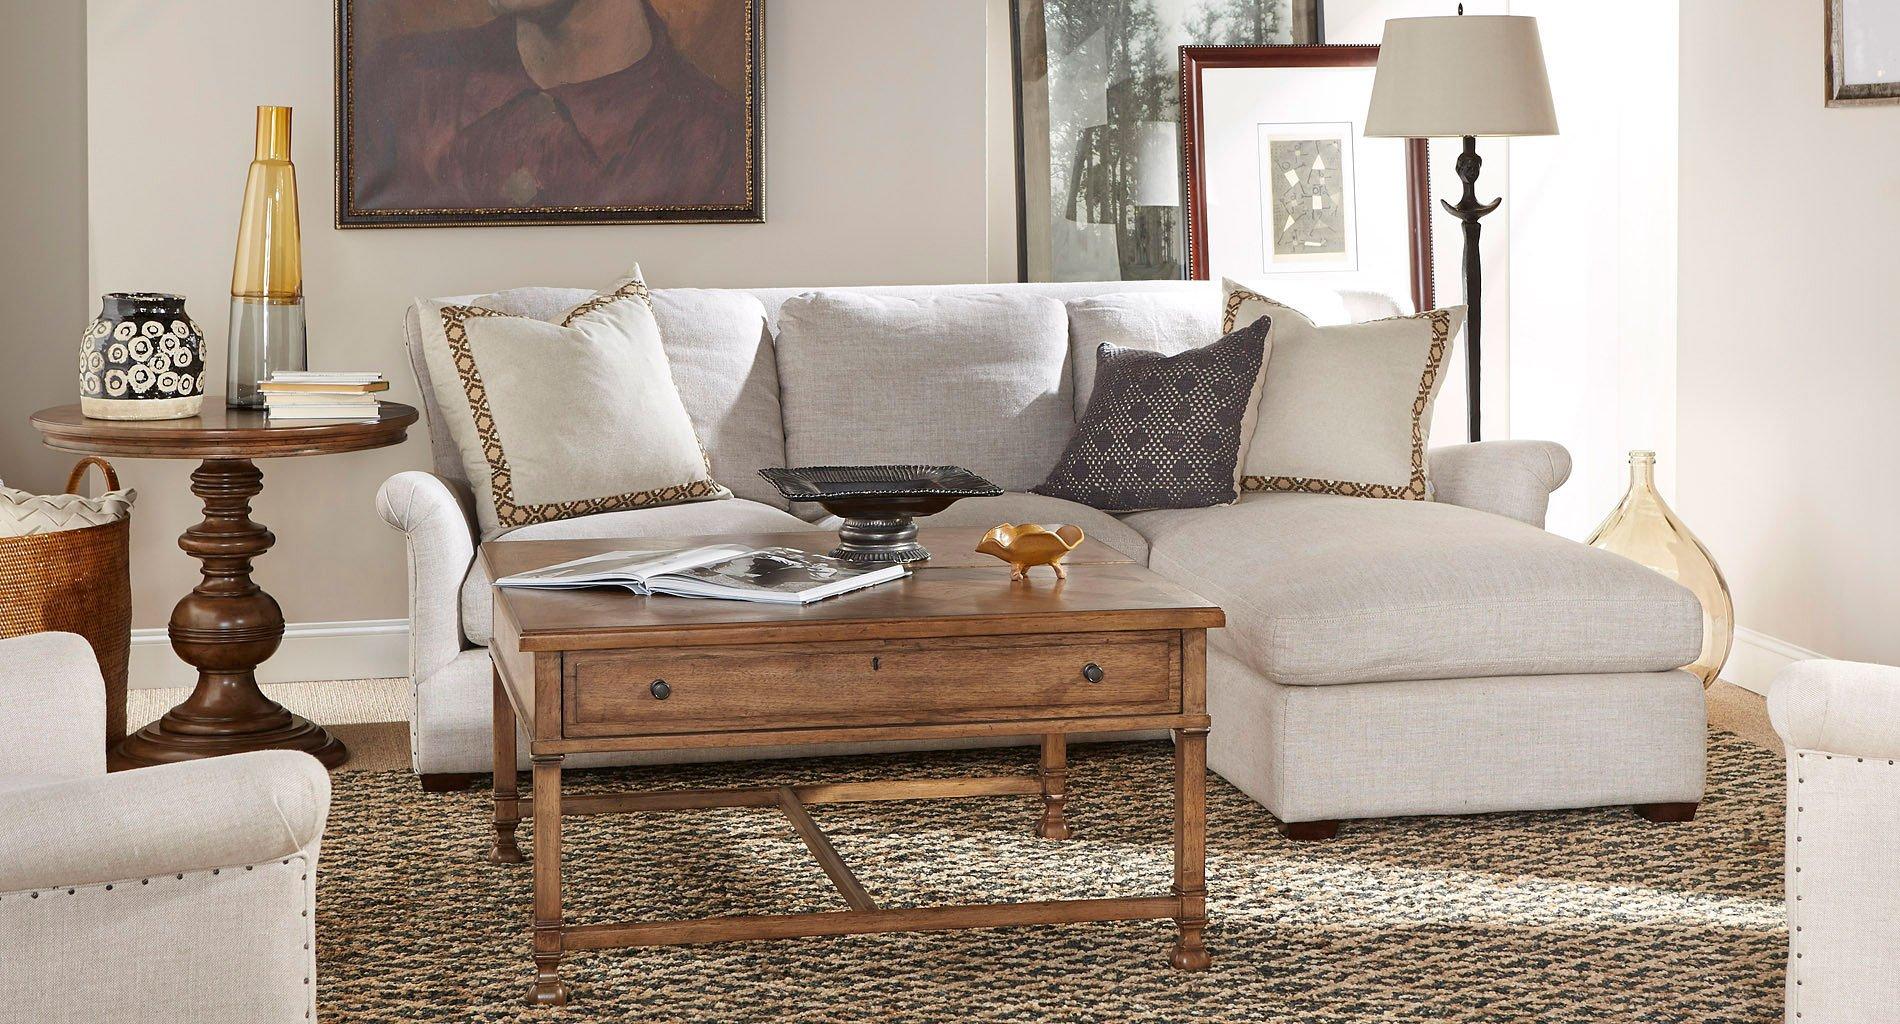 Haven Sofa Chaise Living Room Set (Belgian Linen